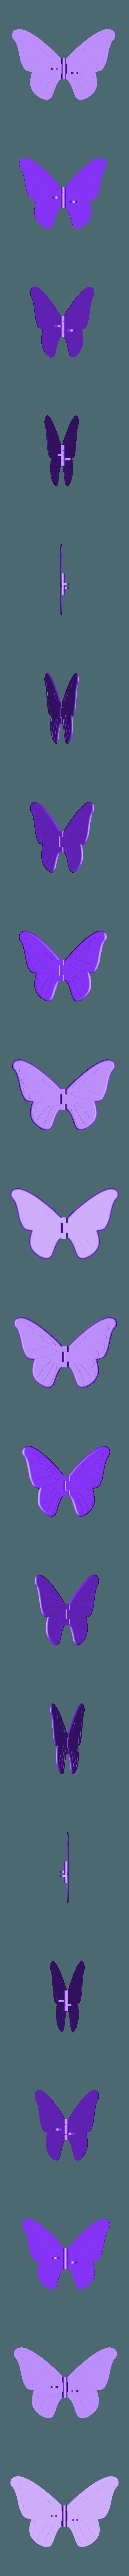 Wings_Indented.stl Download free STL file Butterfly • 3D printer model, gzumwalt